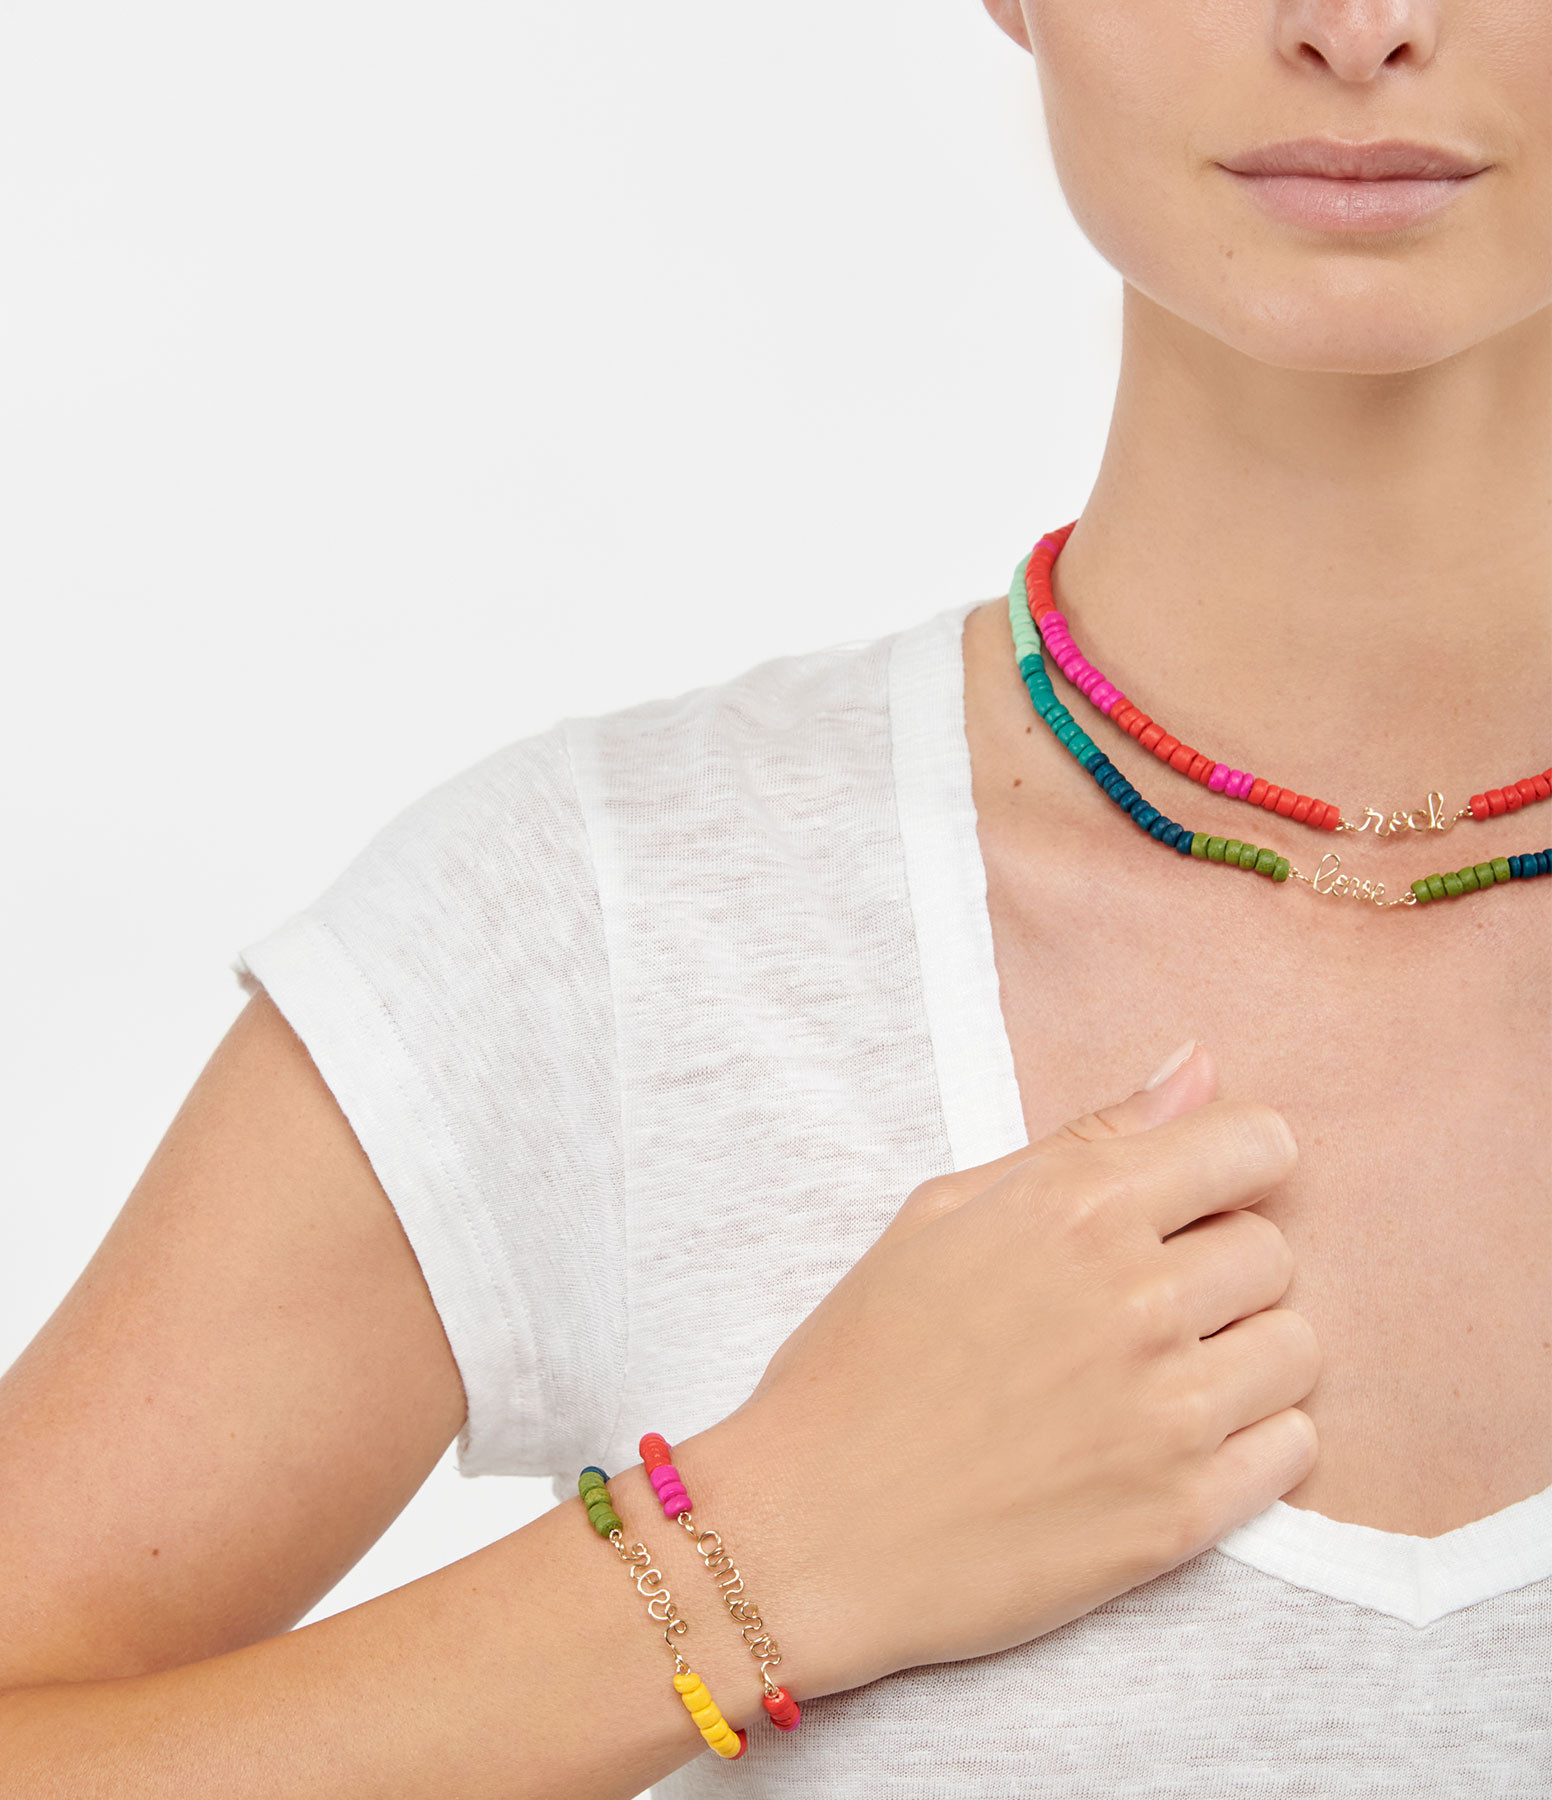 ATELIER PAULIN - Bracelet Medina Rêve Multicolore Gold Filled, Collection Marrakech